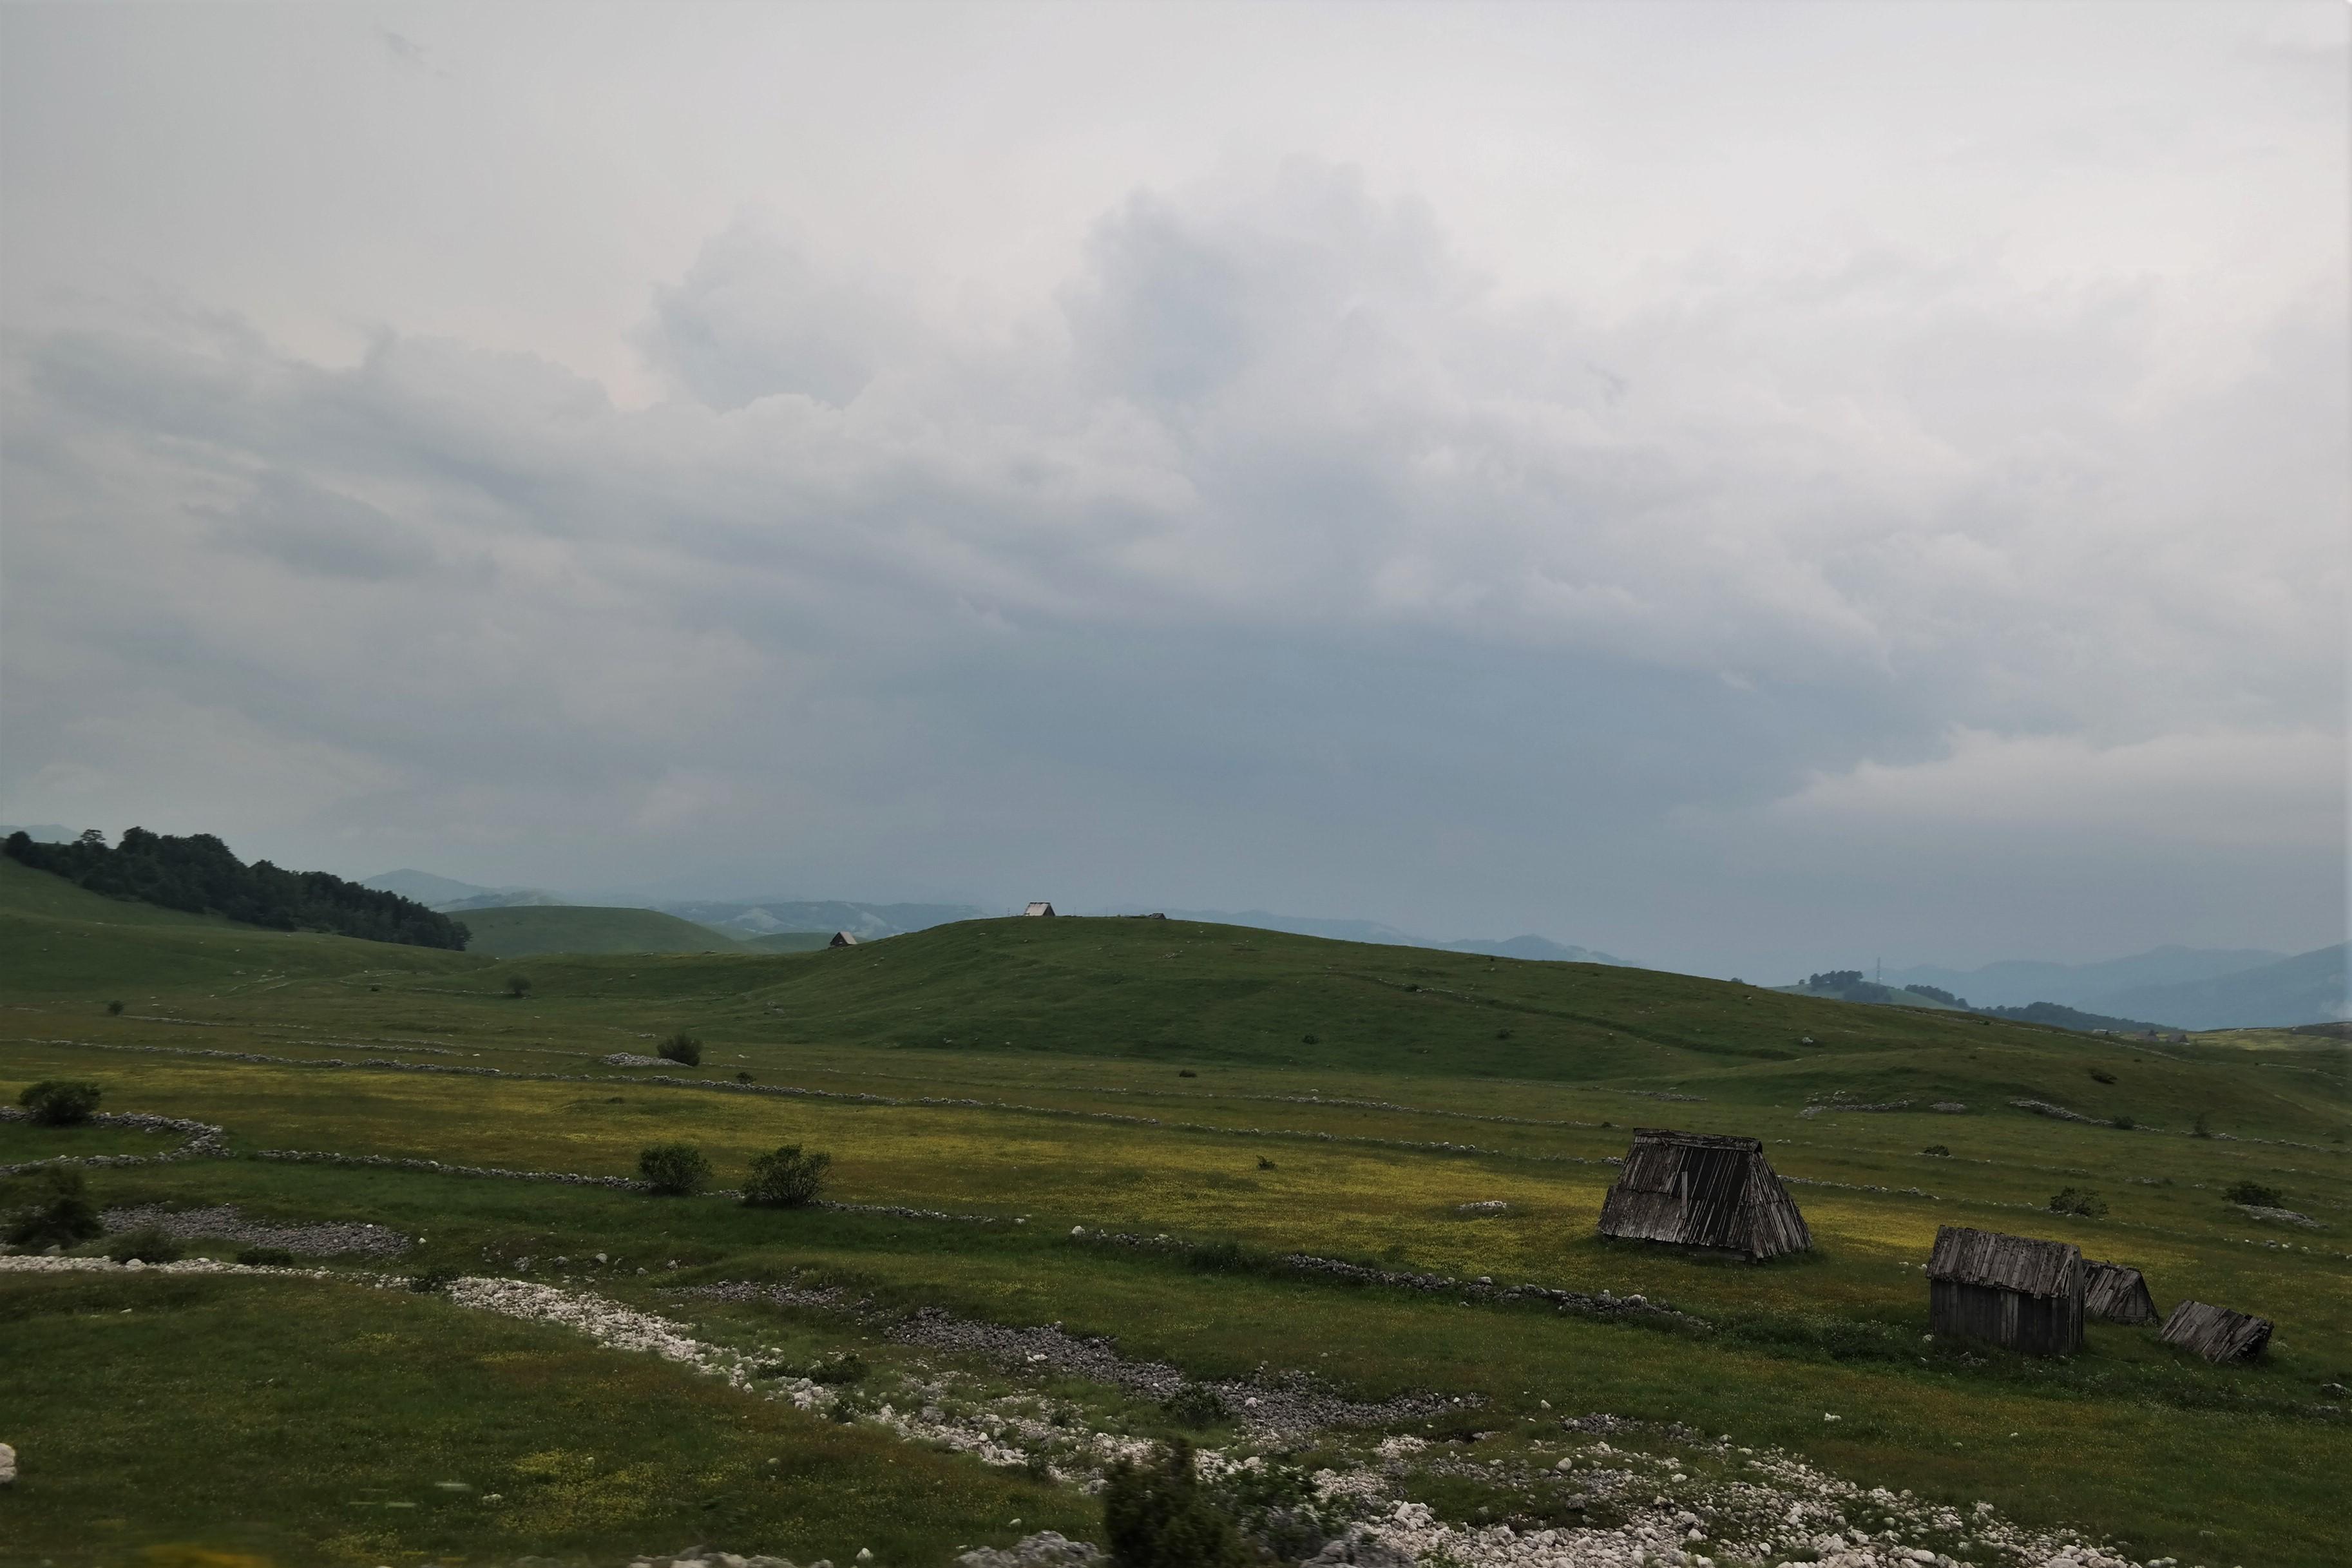 Weg zum Durmitor Nationalpark